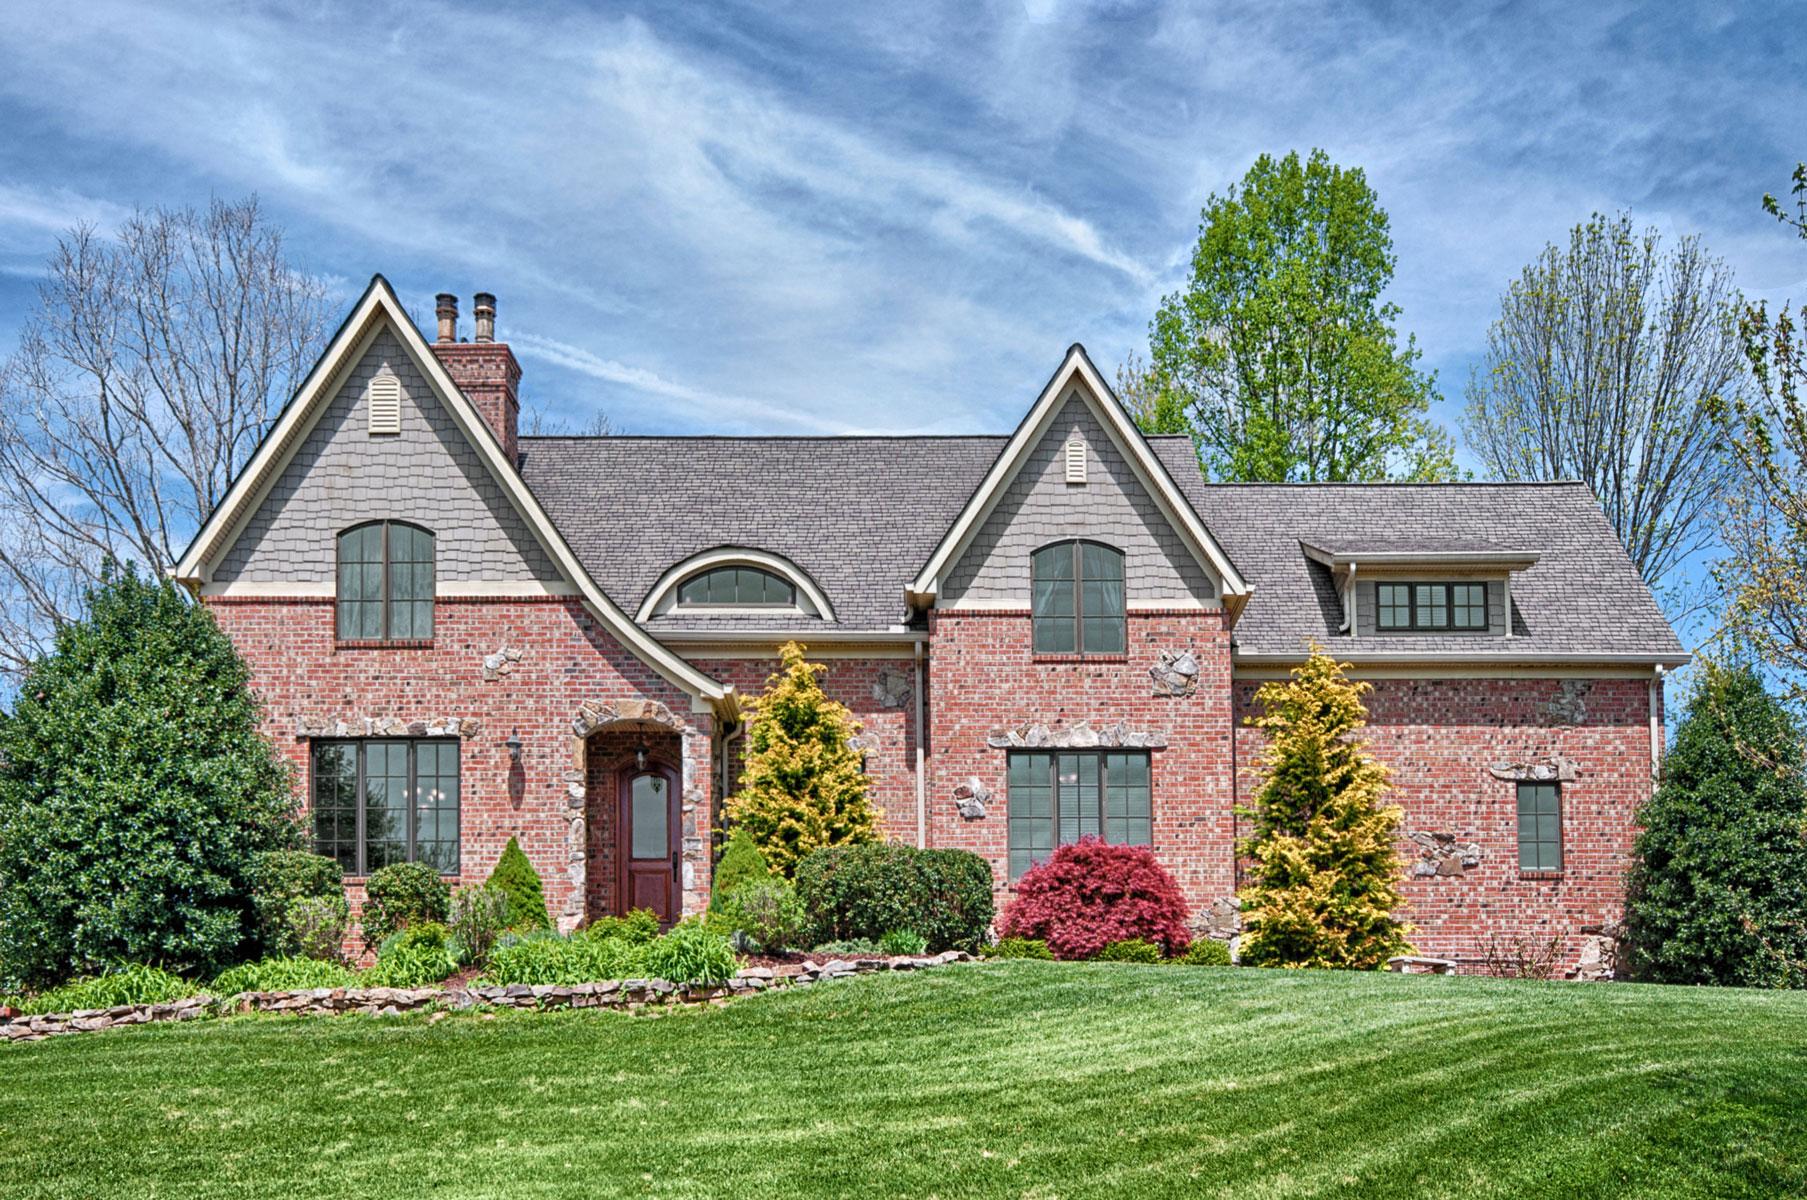 asheville-custom-home-cottage-style-front-elevation